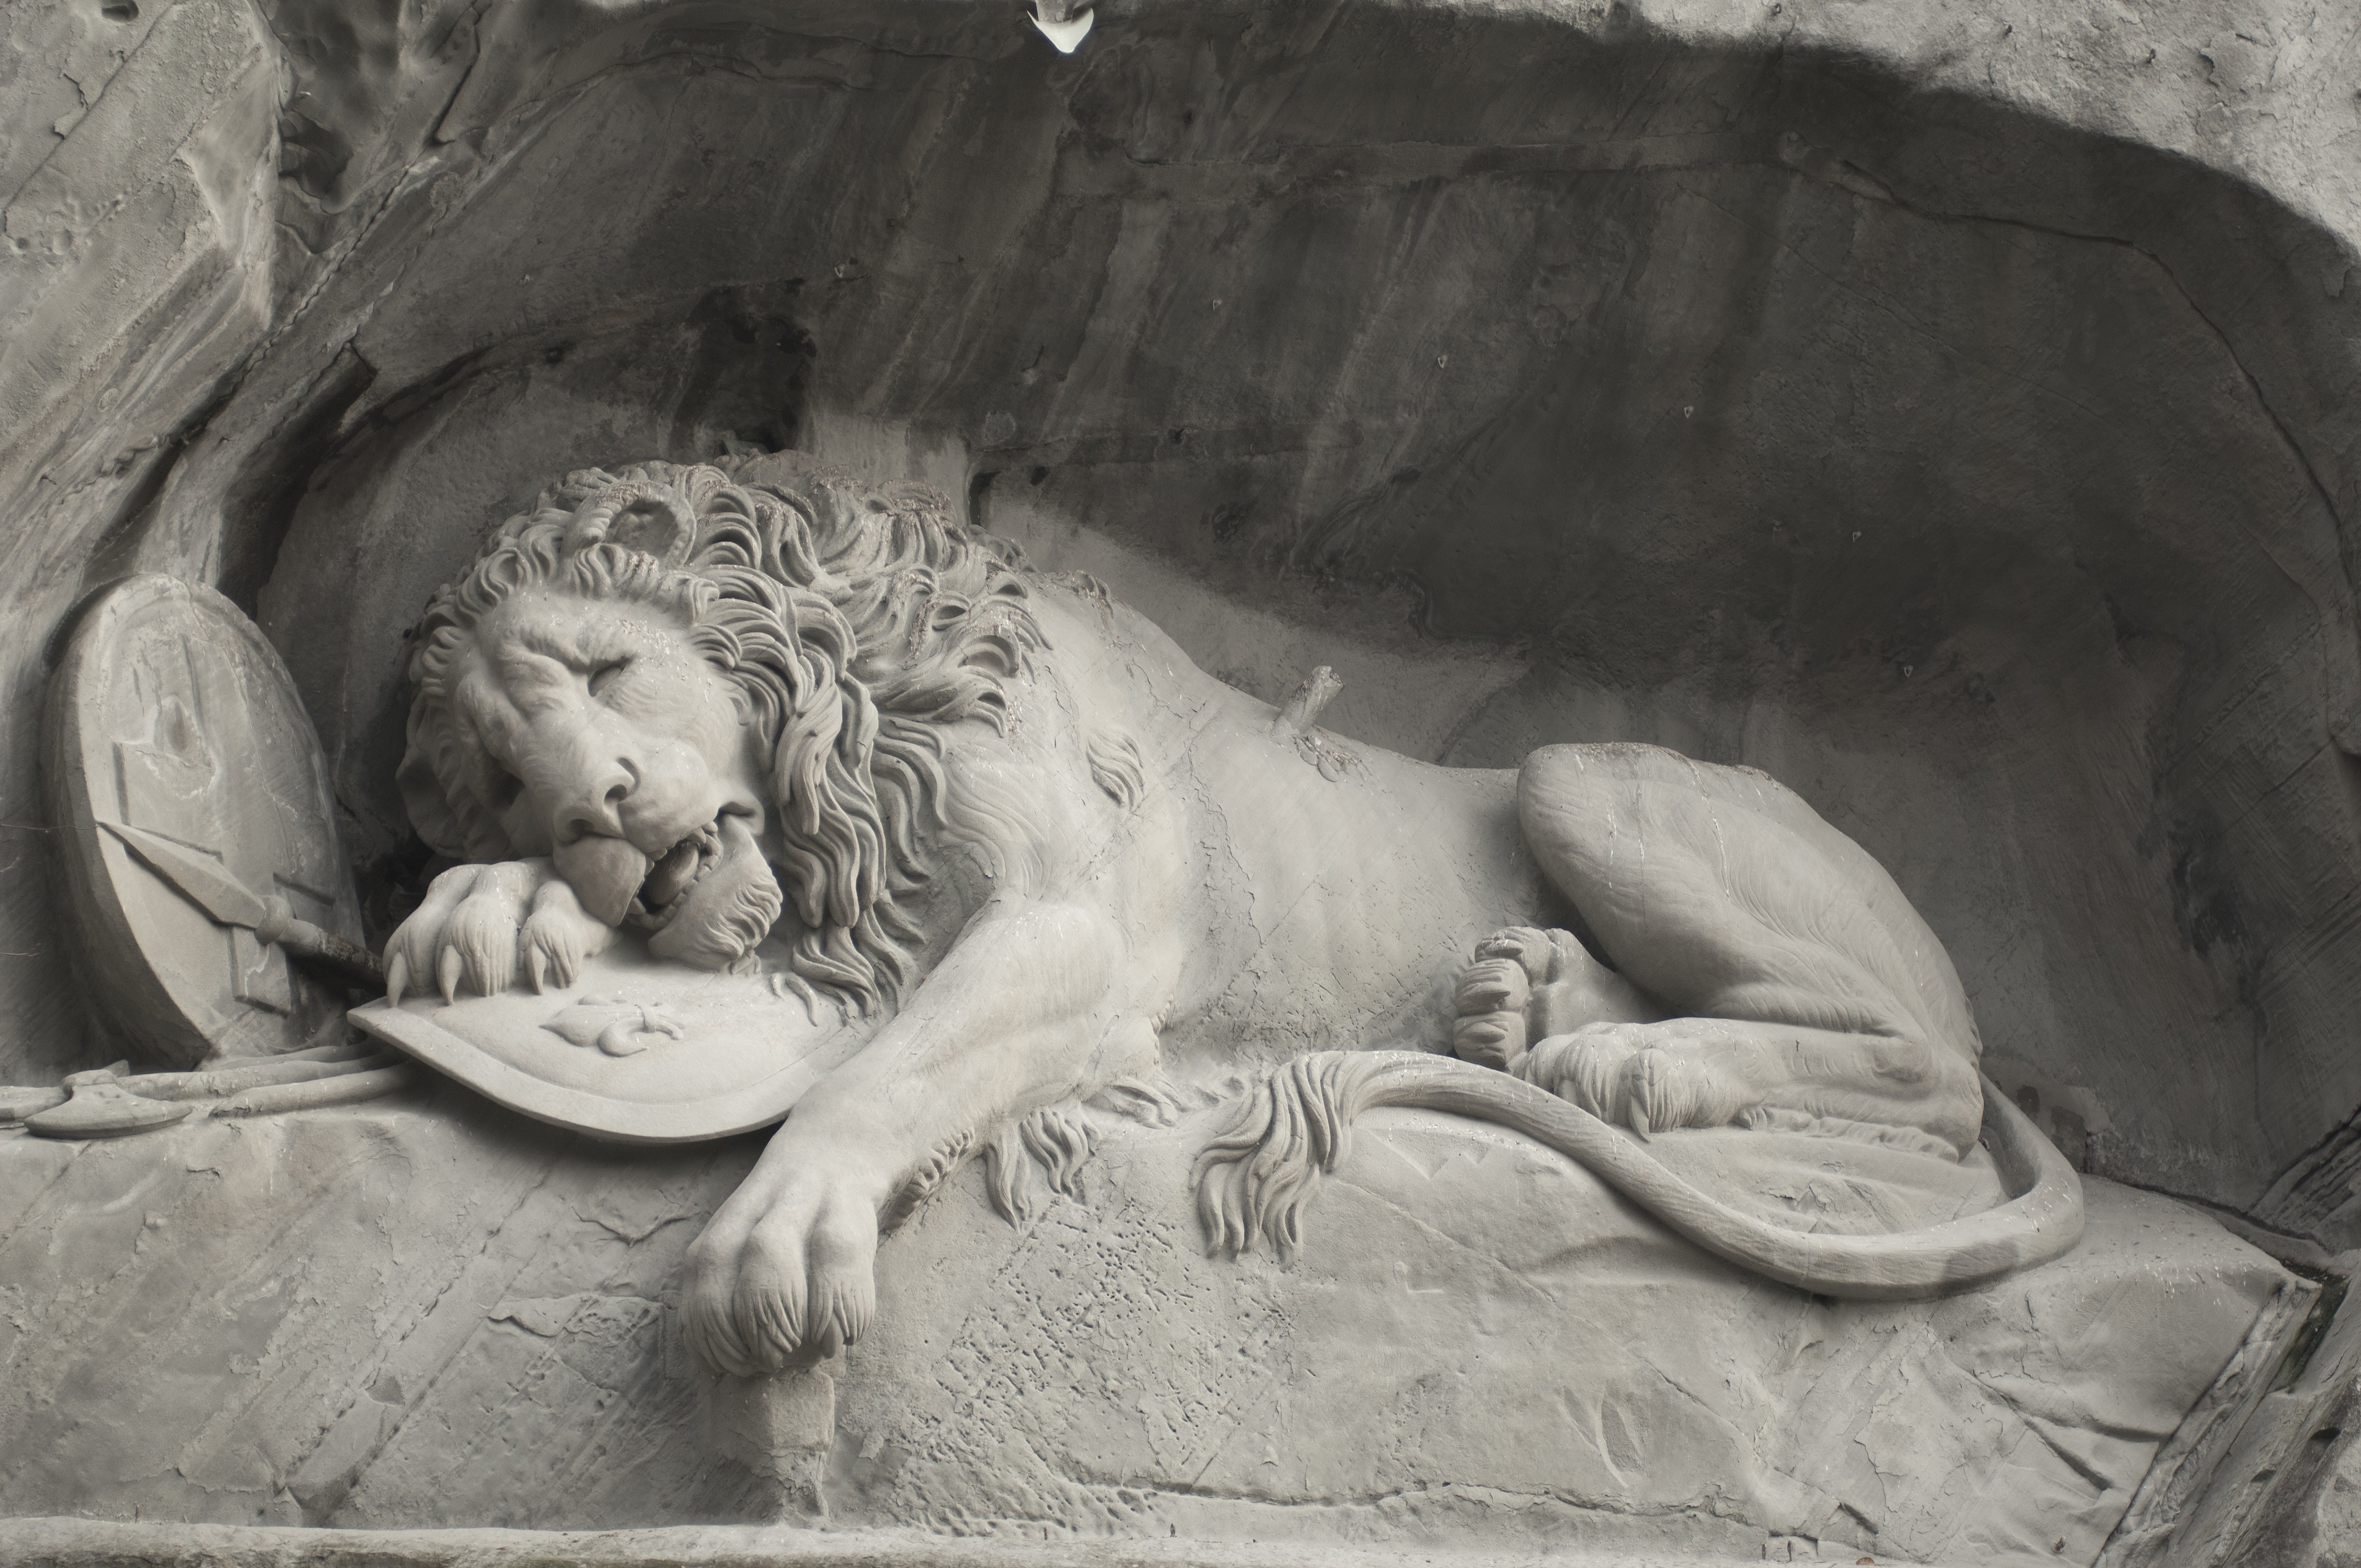 Löwendenkmal - The Lion Monument (Lucerne) 02.jpg